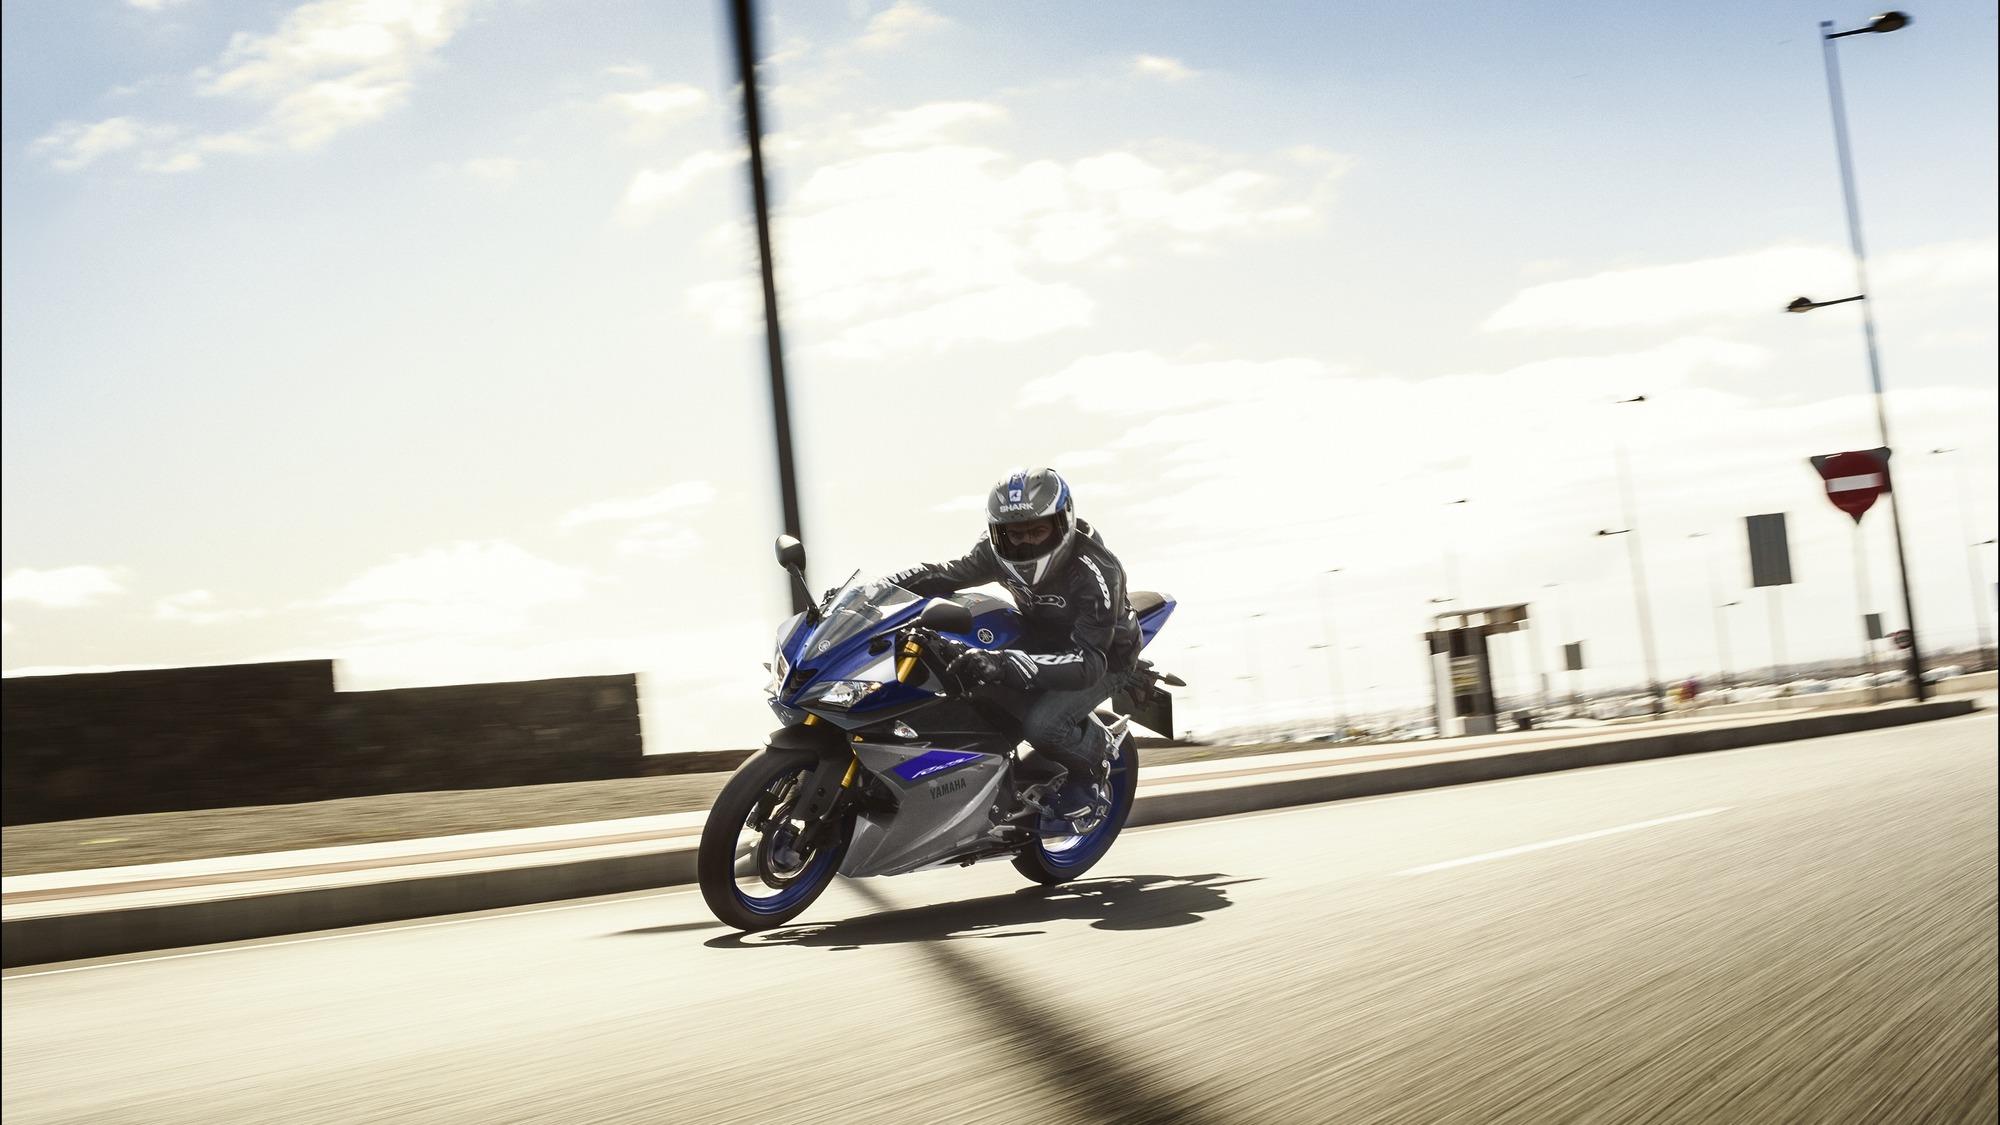 Yamaha starts testing R125 in India